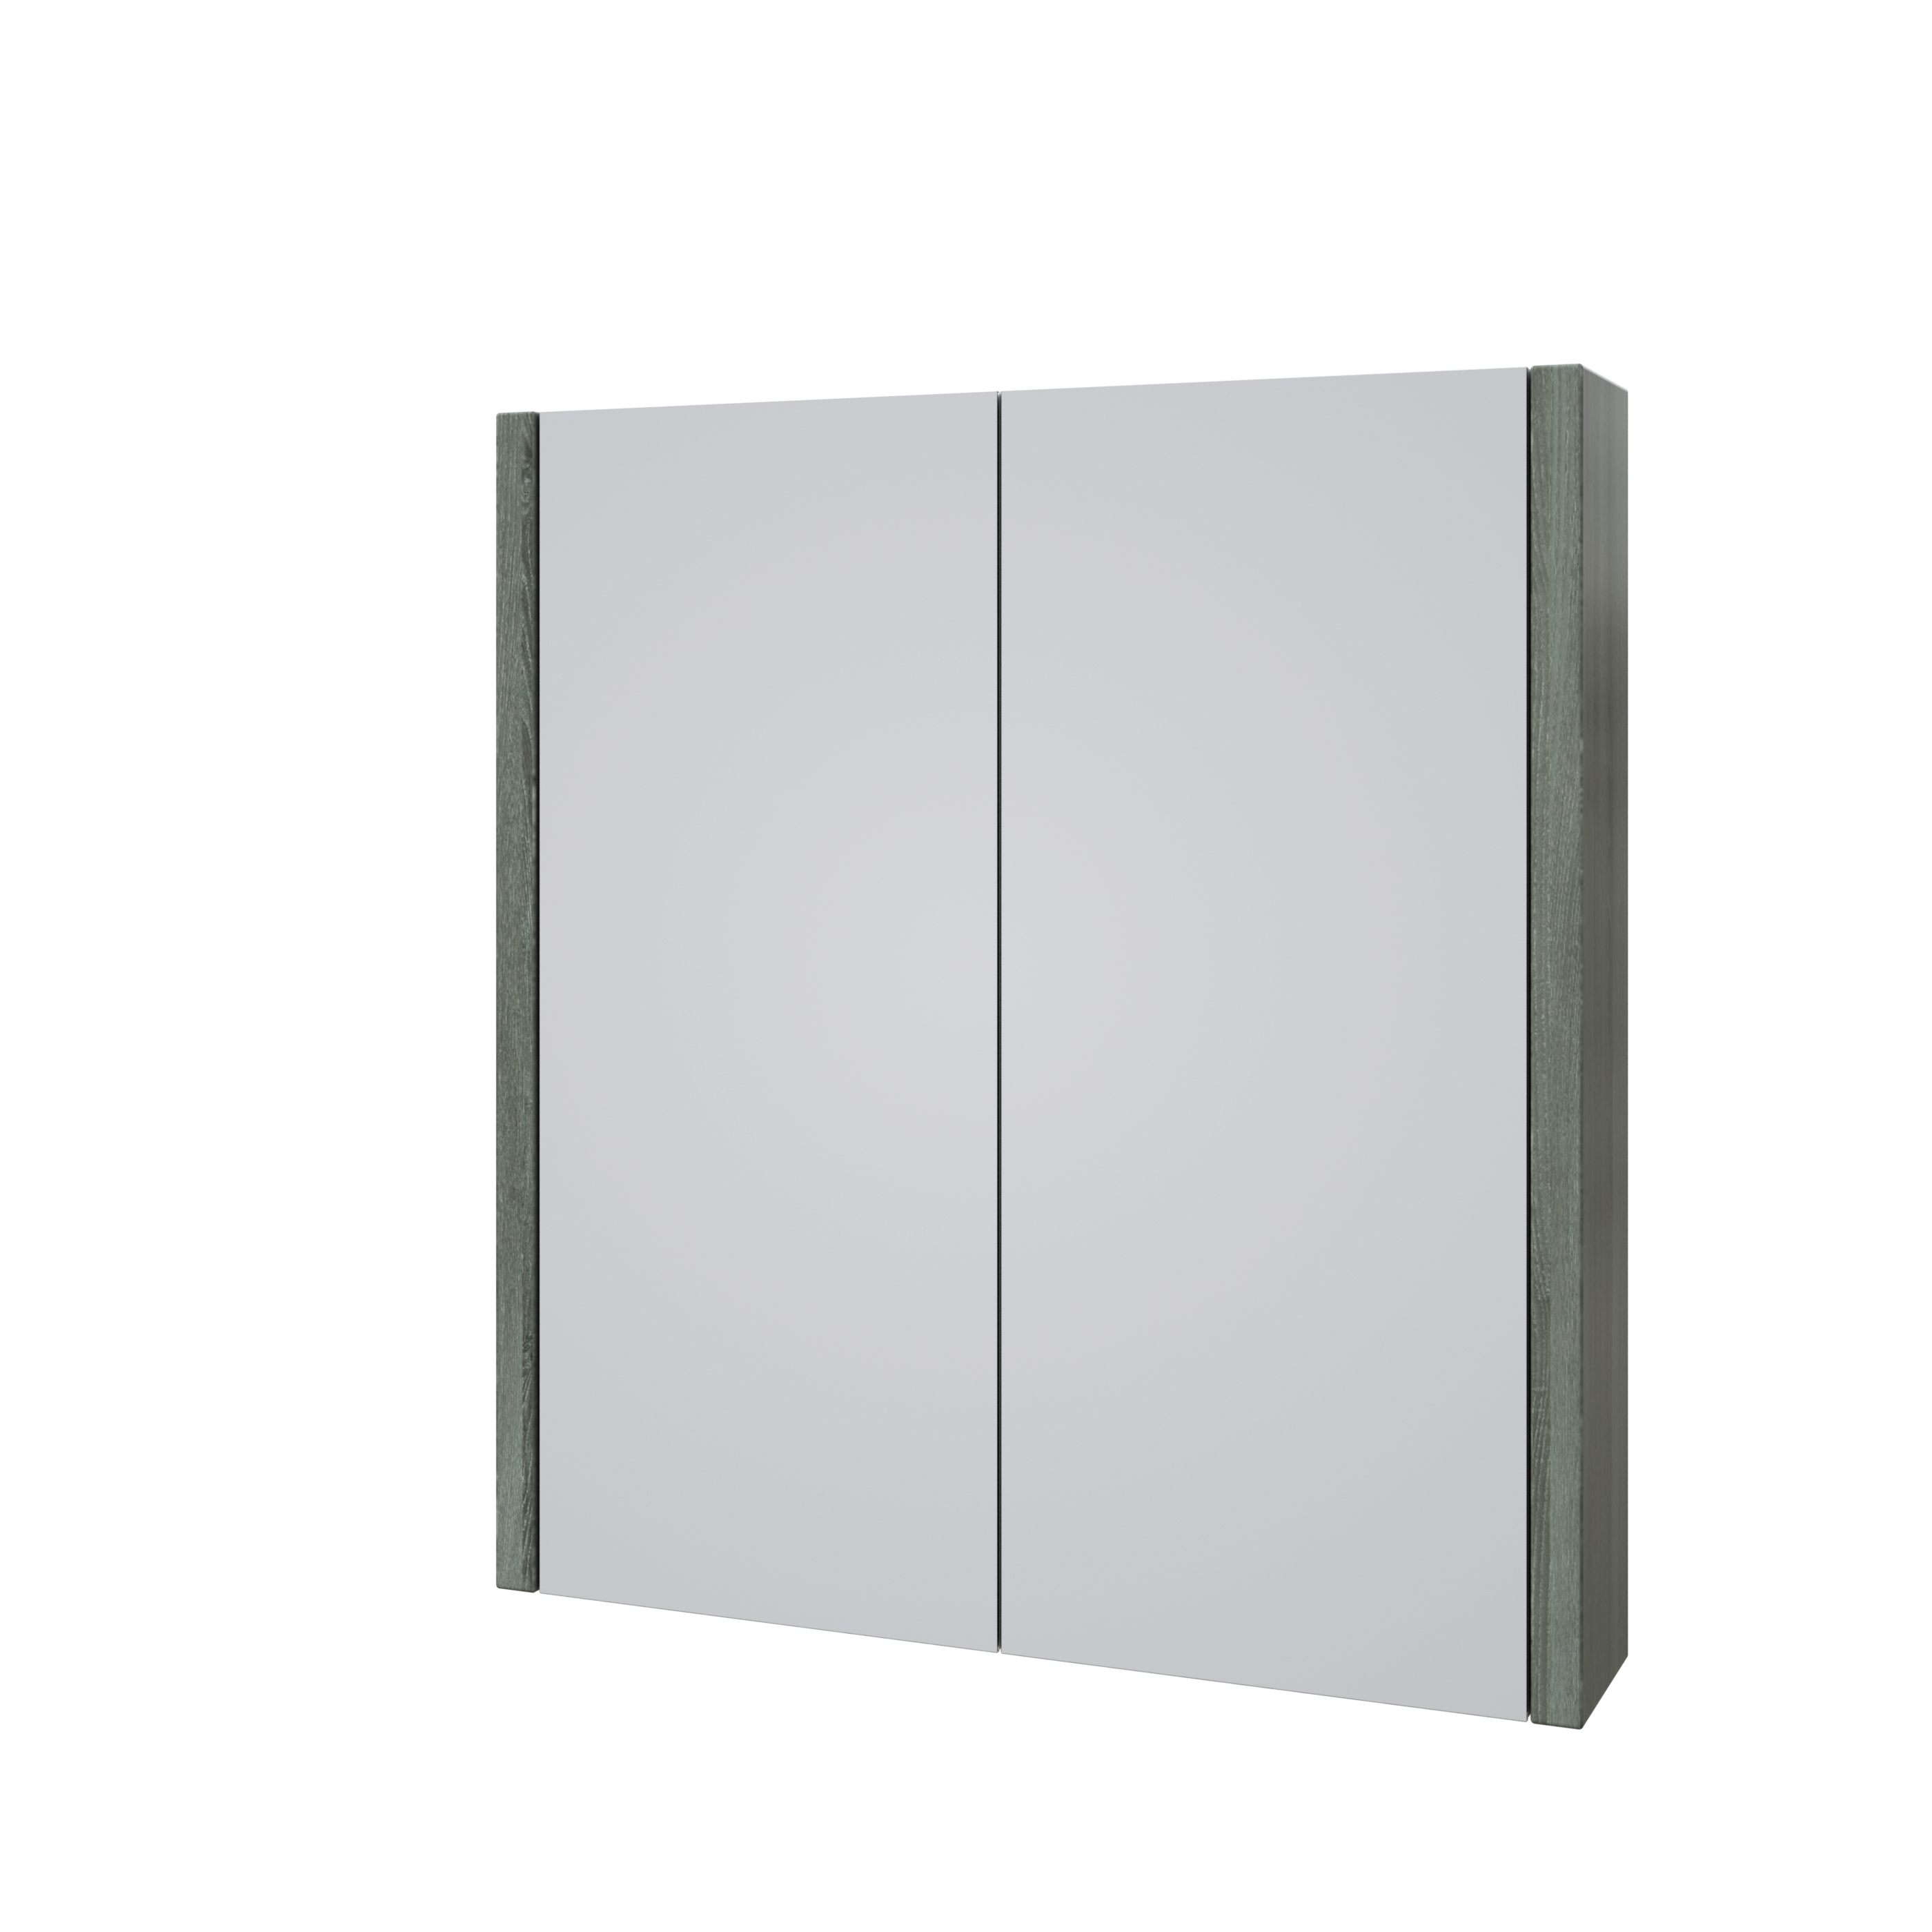 Purity 600mm Mirror Cabinet Grey Ash